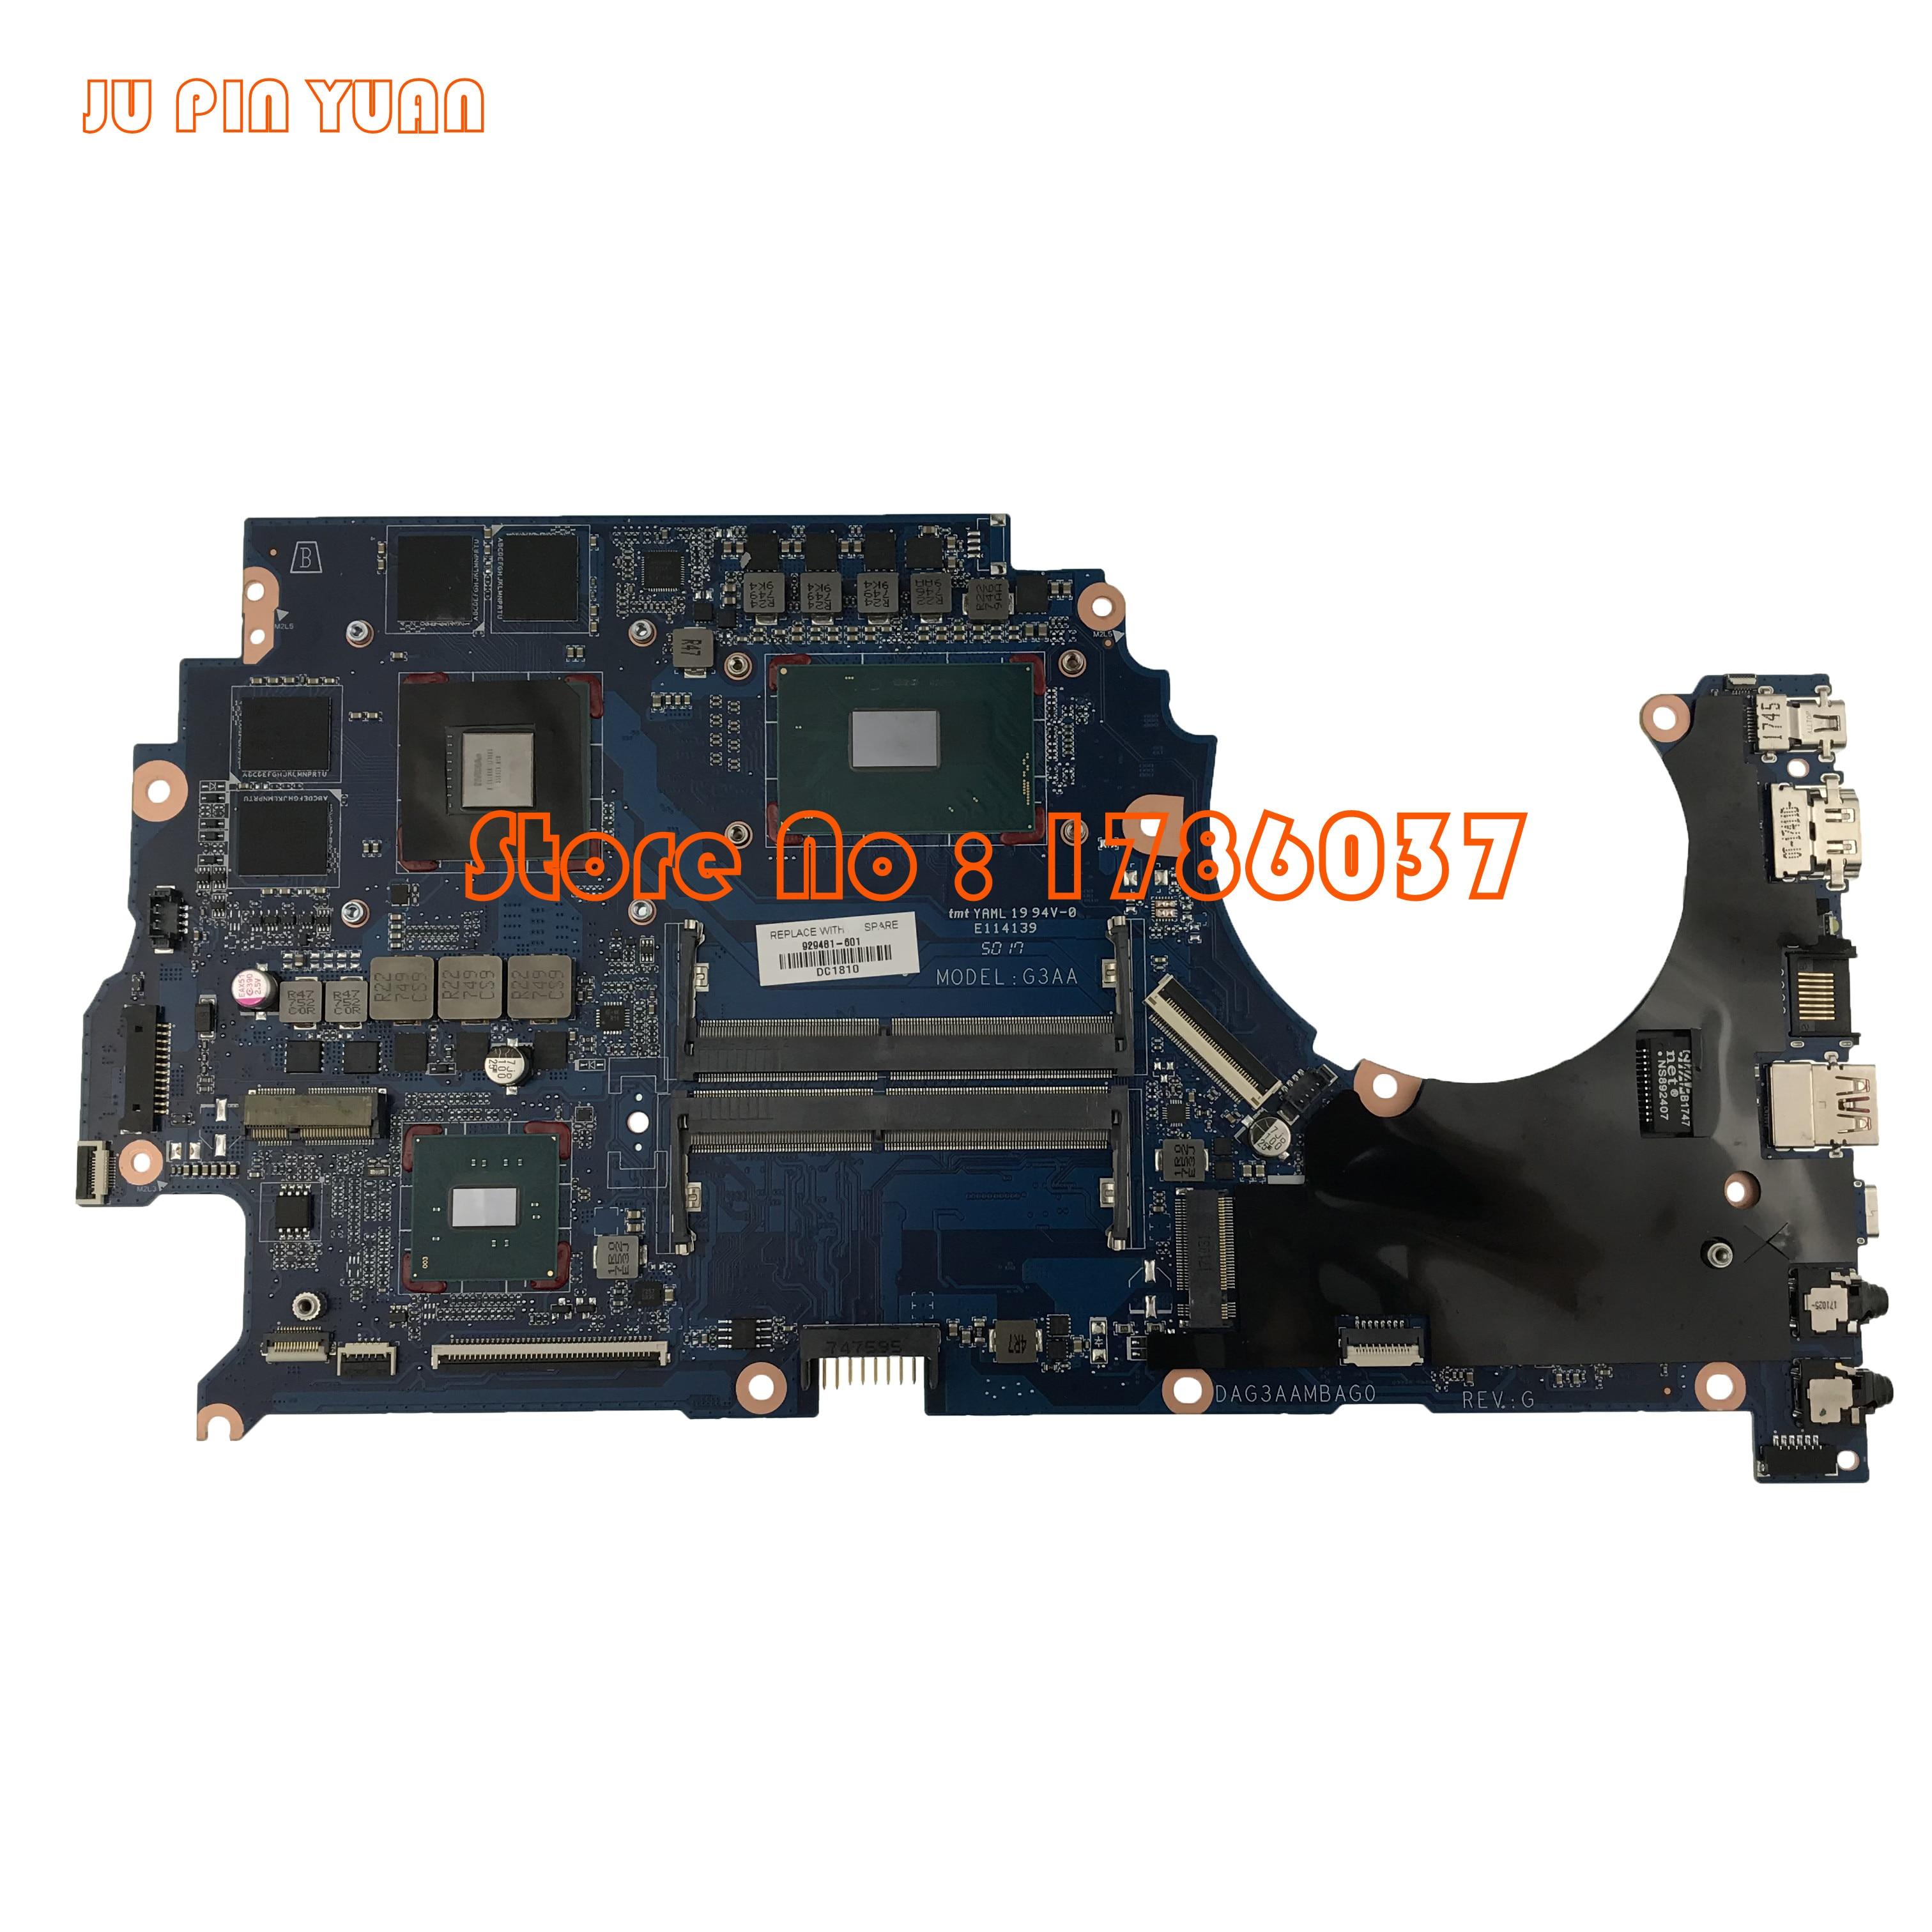 929481-001 929481-601, 929481-501 DAG3AAMBAE0 para HP Qmen TPN-Q194 15-CE 15T-CE placa base de computadora portátil withGTX1050Ti 4GB i7-7700HQ